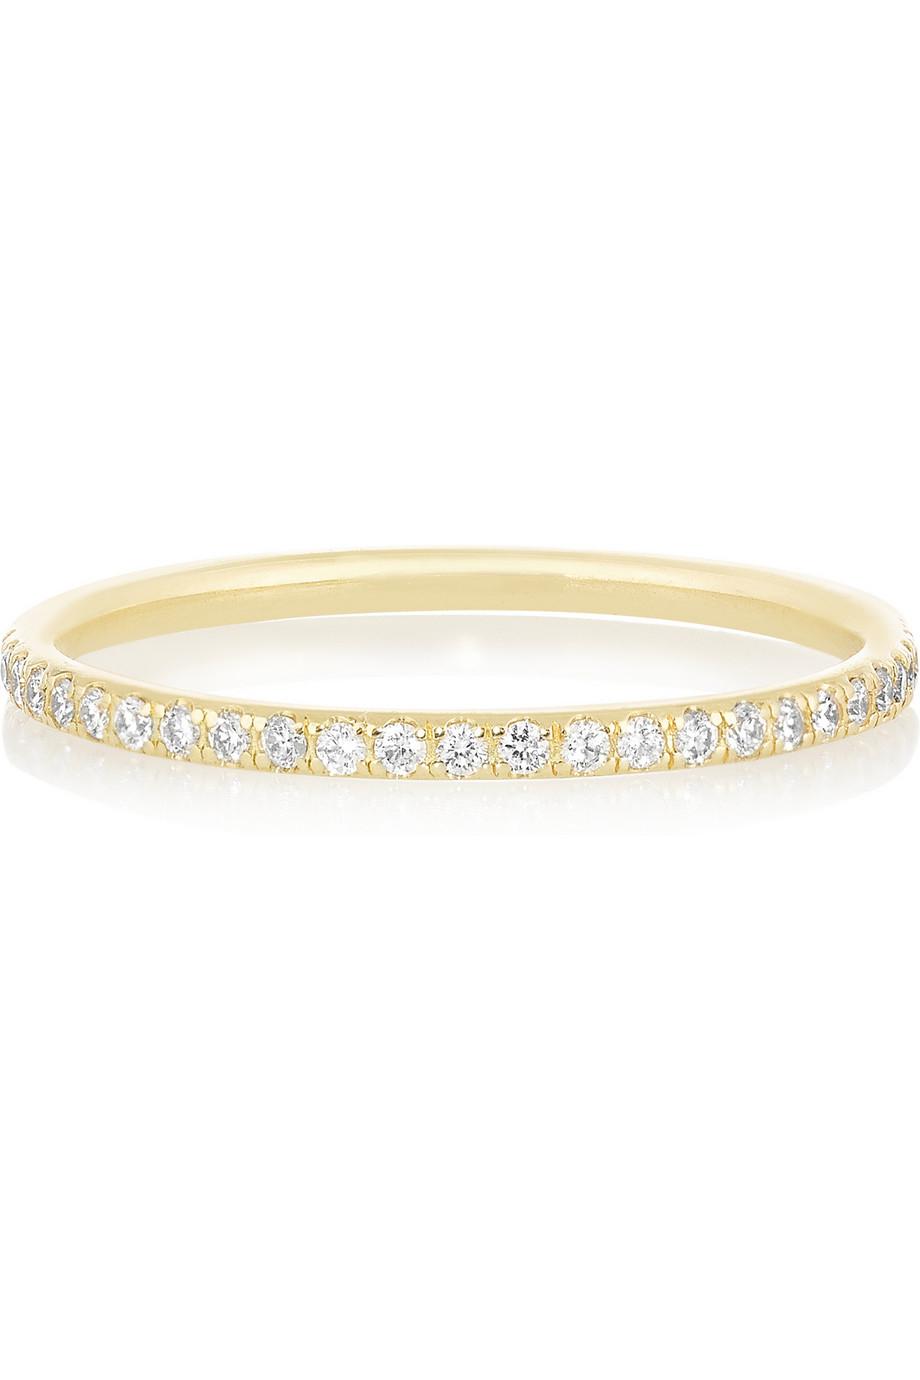 Womens Yellow Diamond & Gold Thread Band Ileana Makri XhrVQ05W6